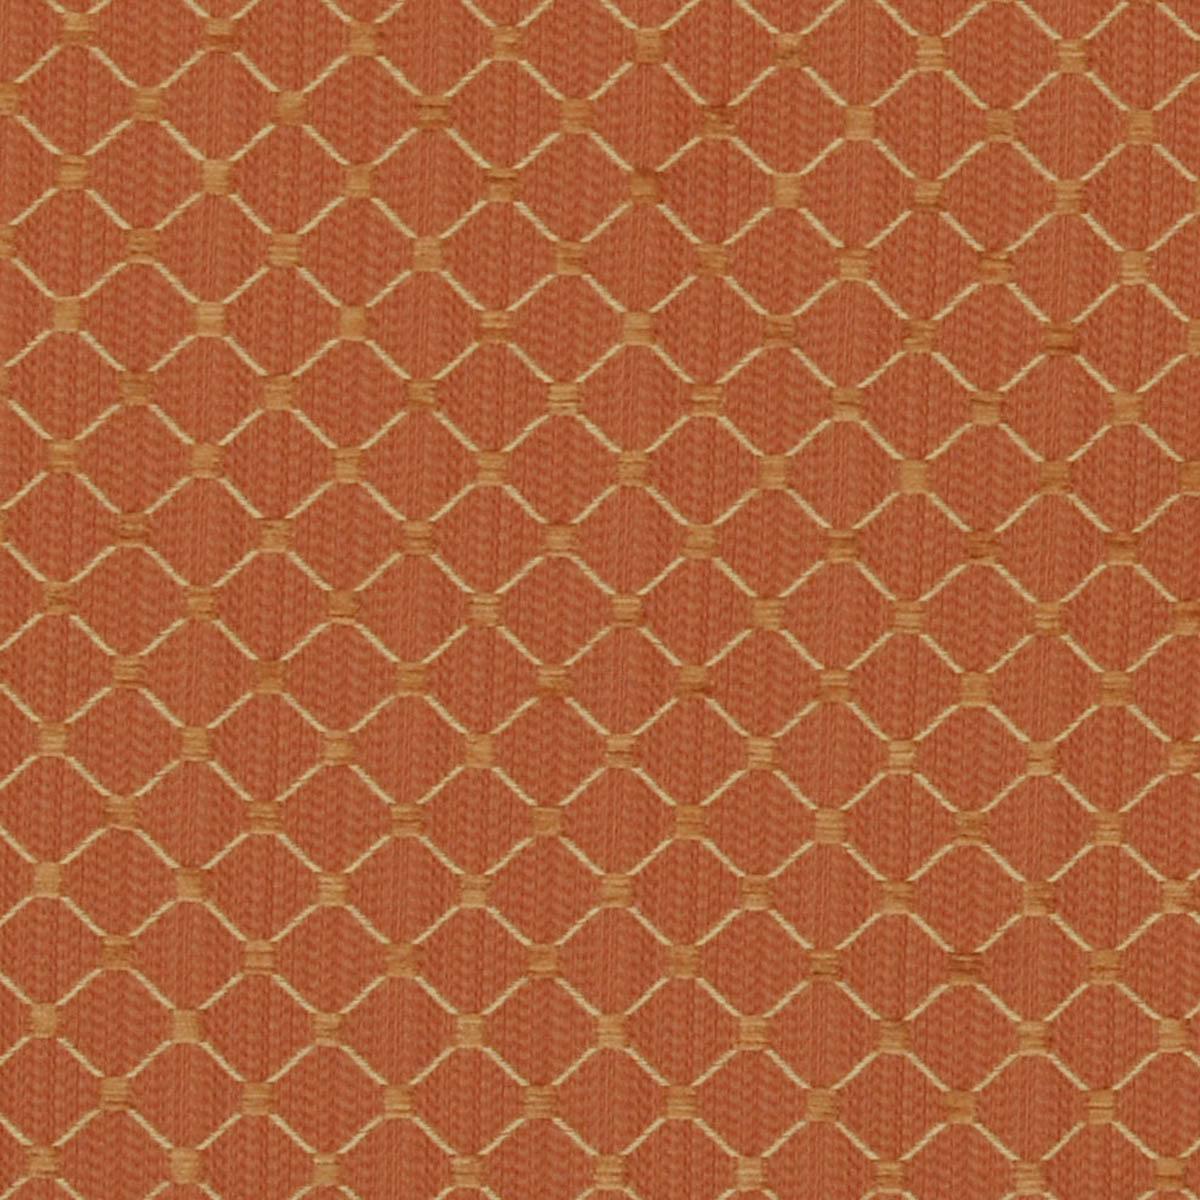 Terracotta Curtain Fabric Uk | www.redglobalmx.org